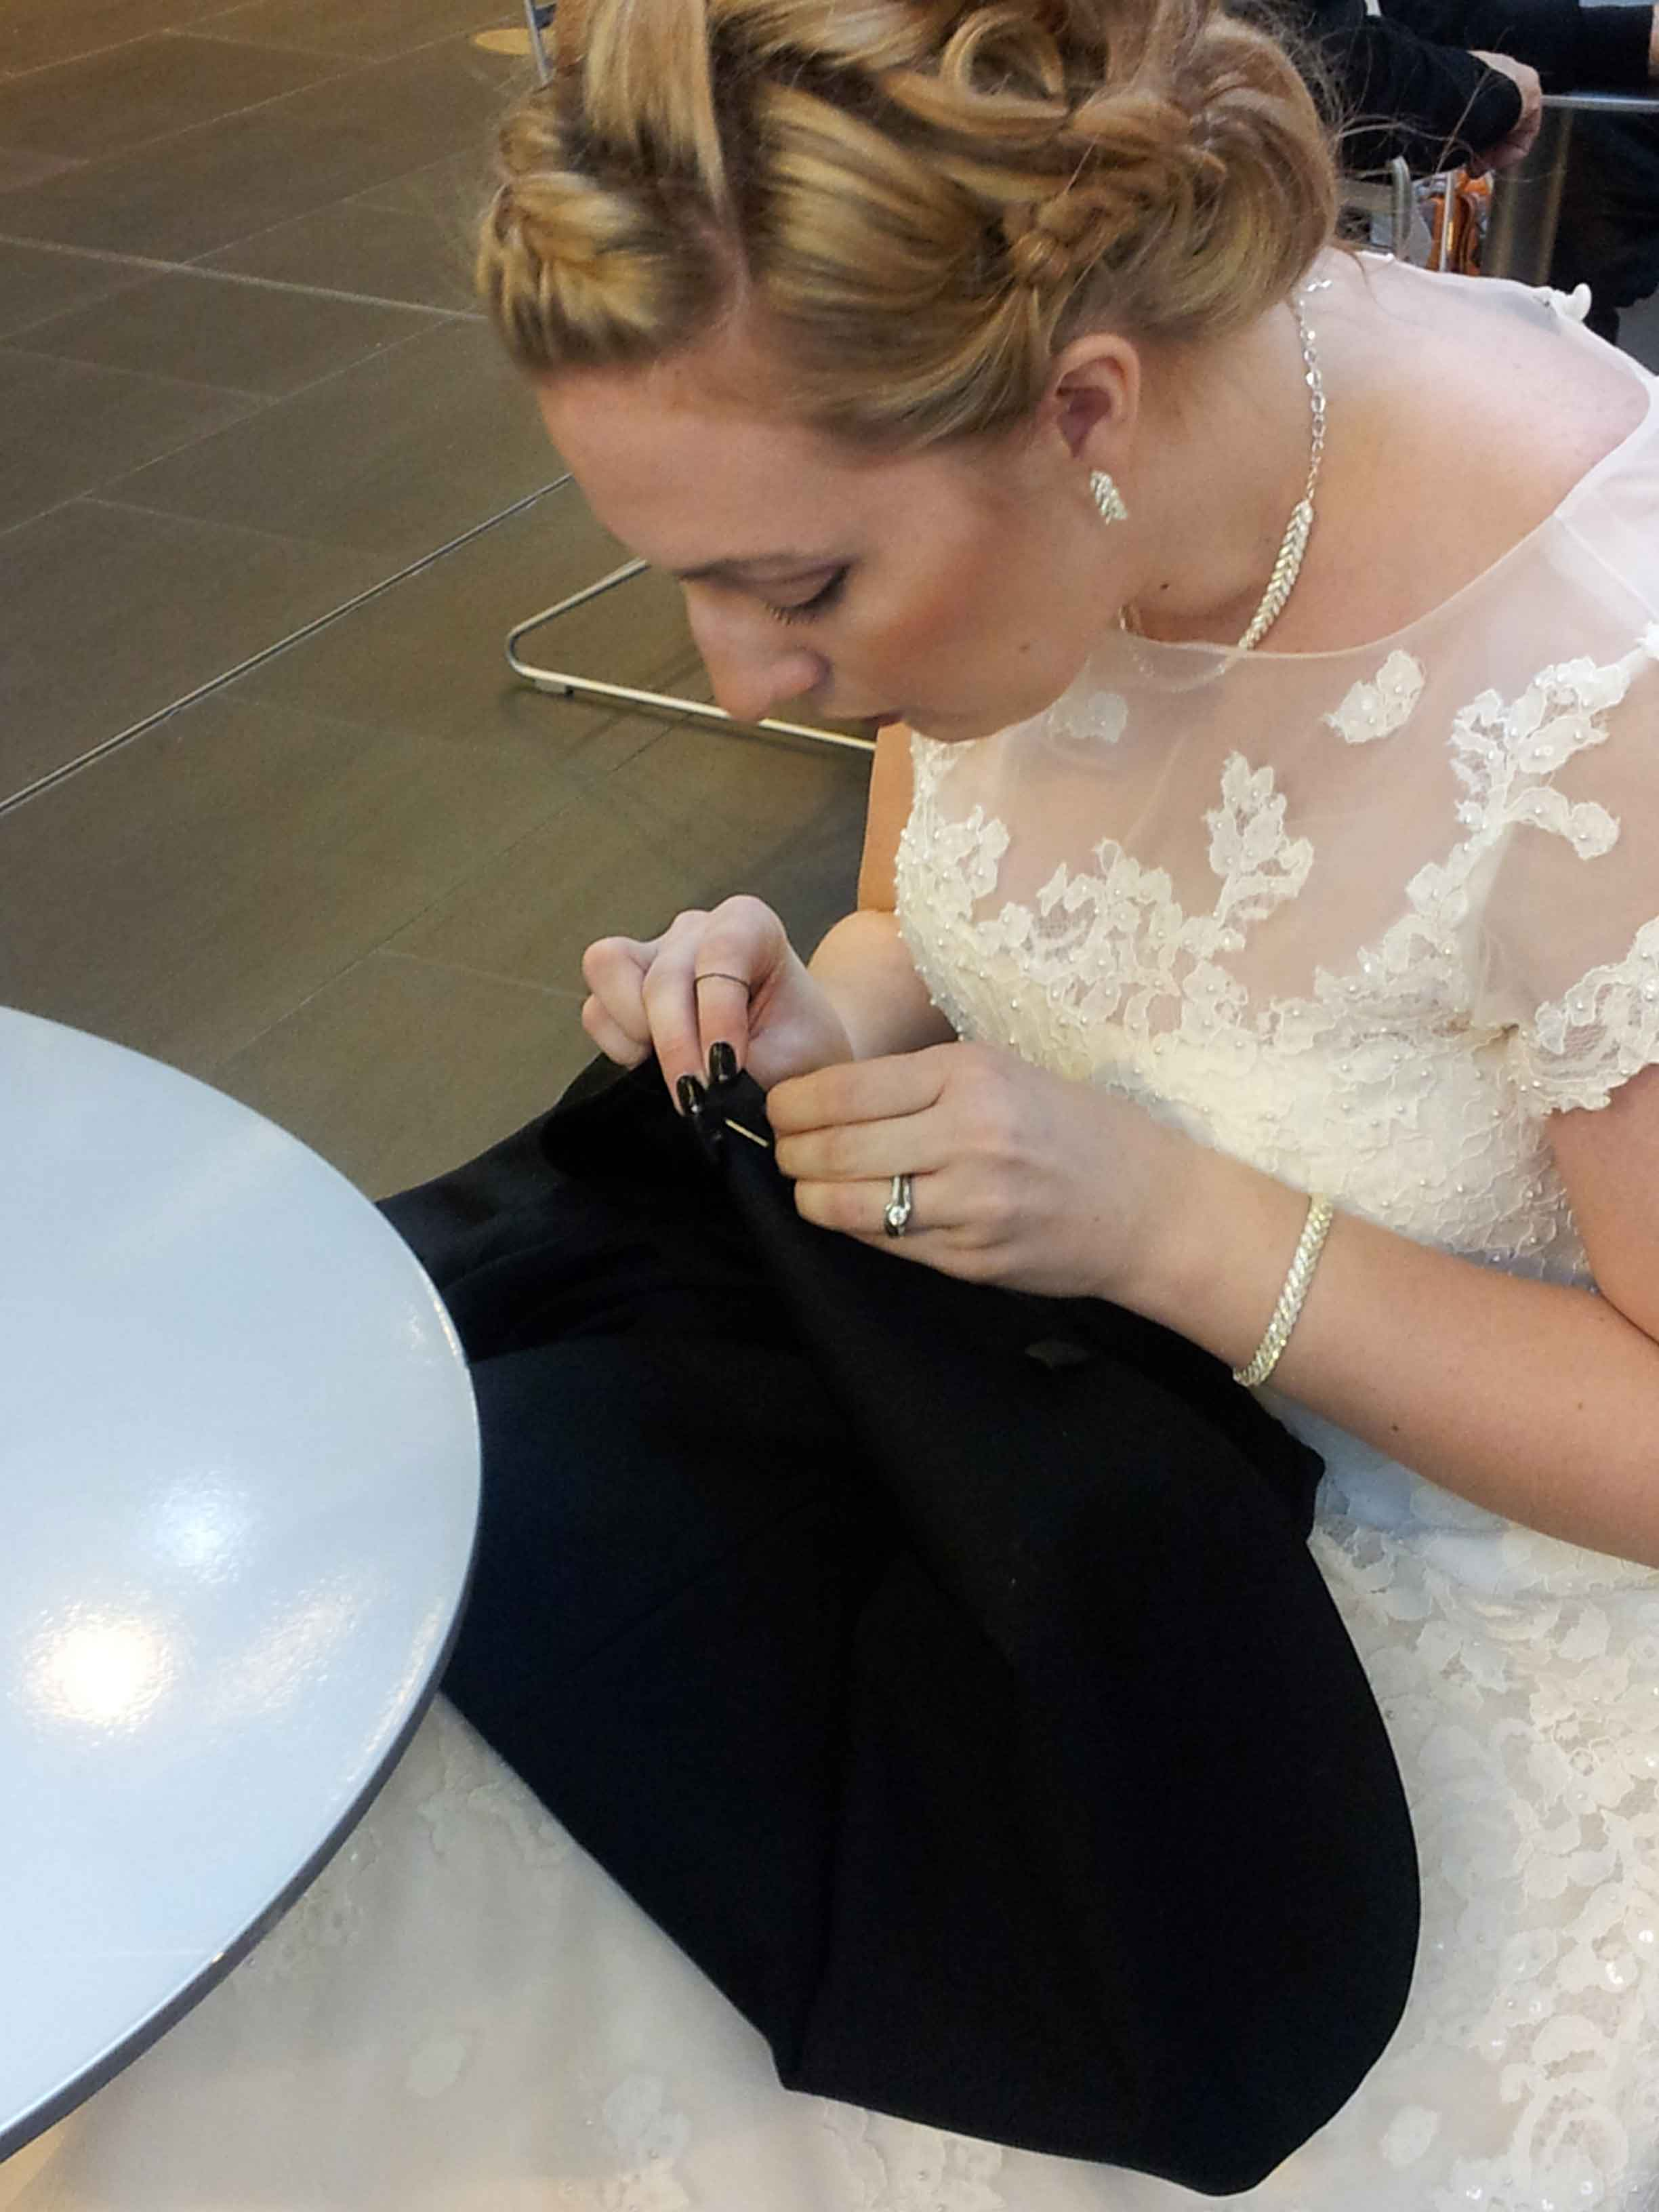 Me Sewing